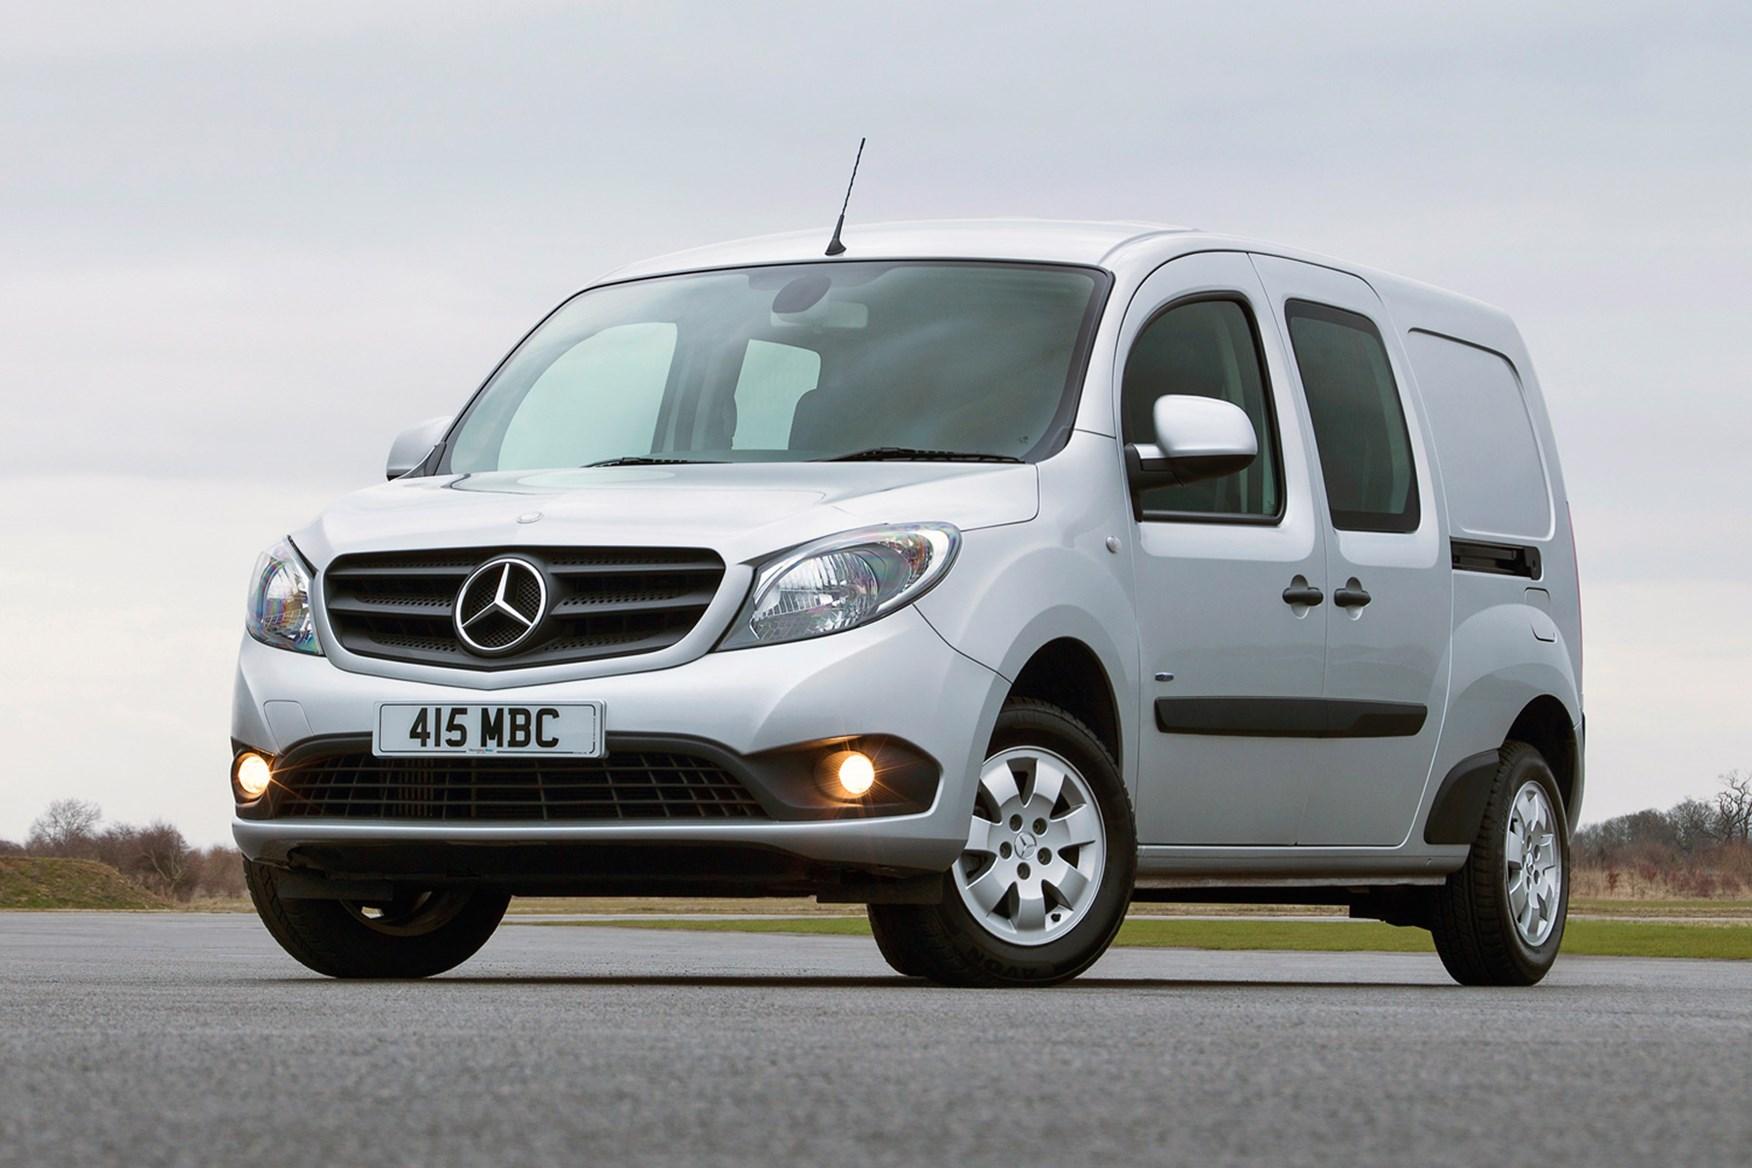 Mercedes-Benz Citan full review on Parkers Vans - front exterior